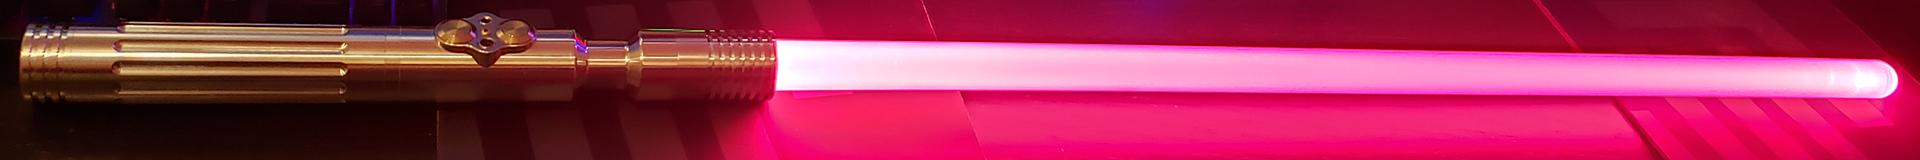 StJude-Pink